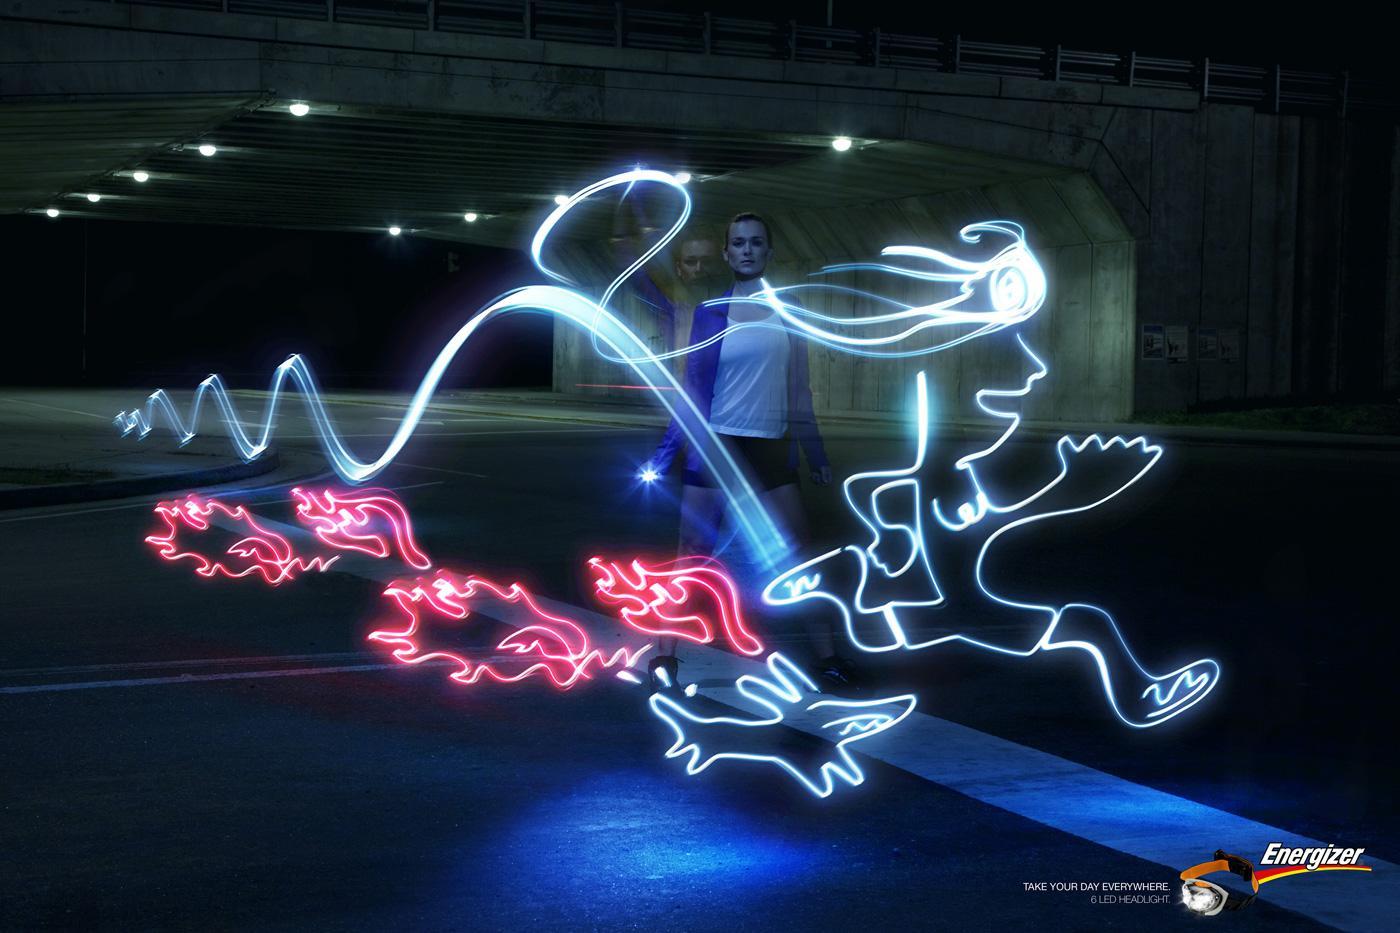 Energizer Print Ad -  Jogging